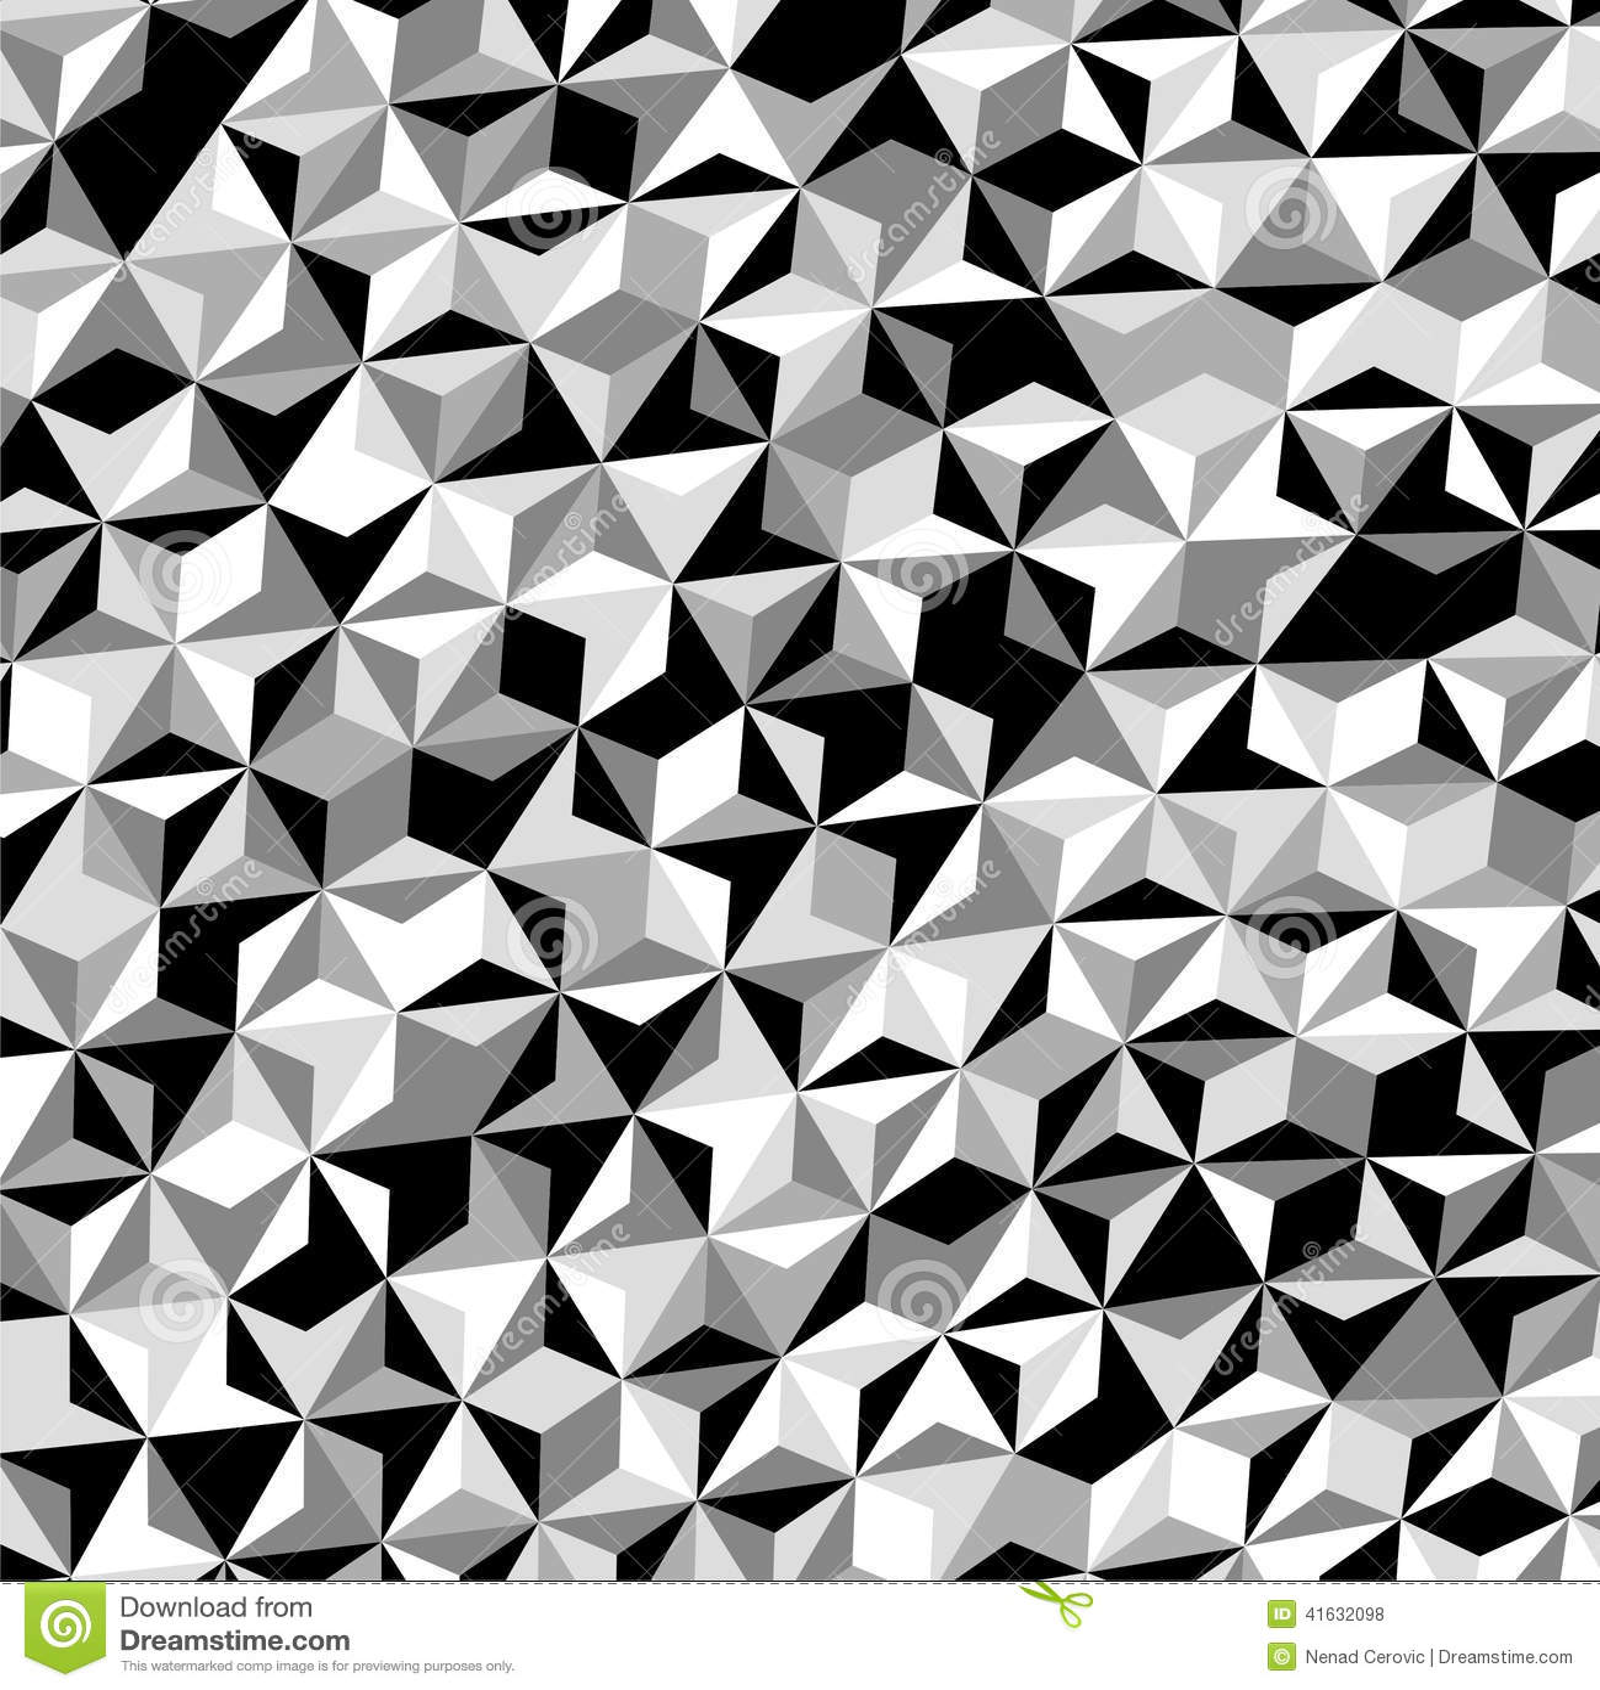 black and white geometric triangle pattern